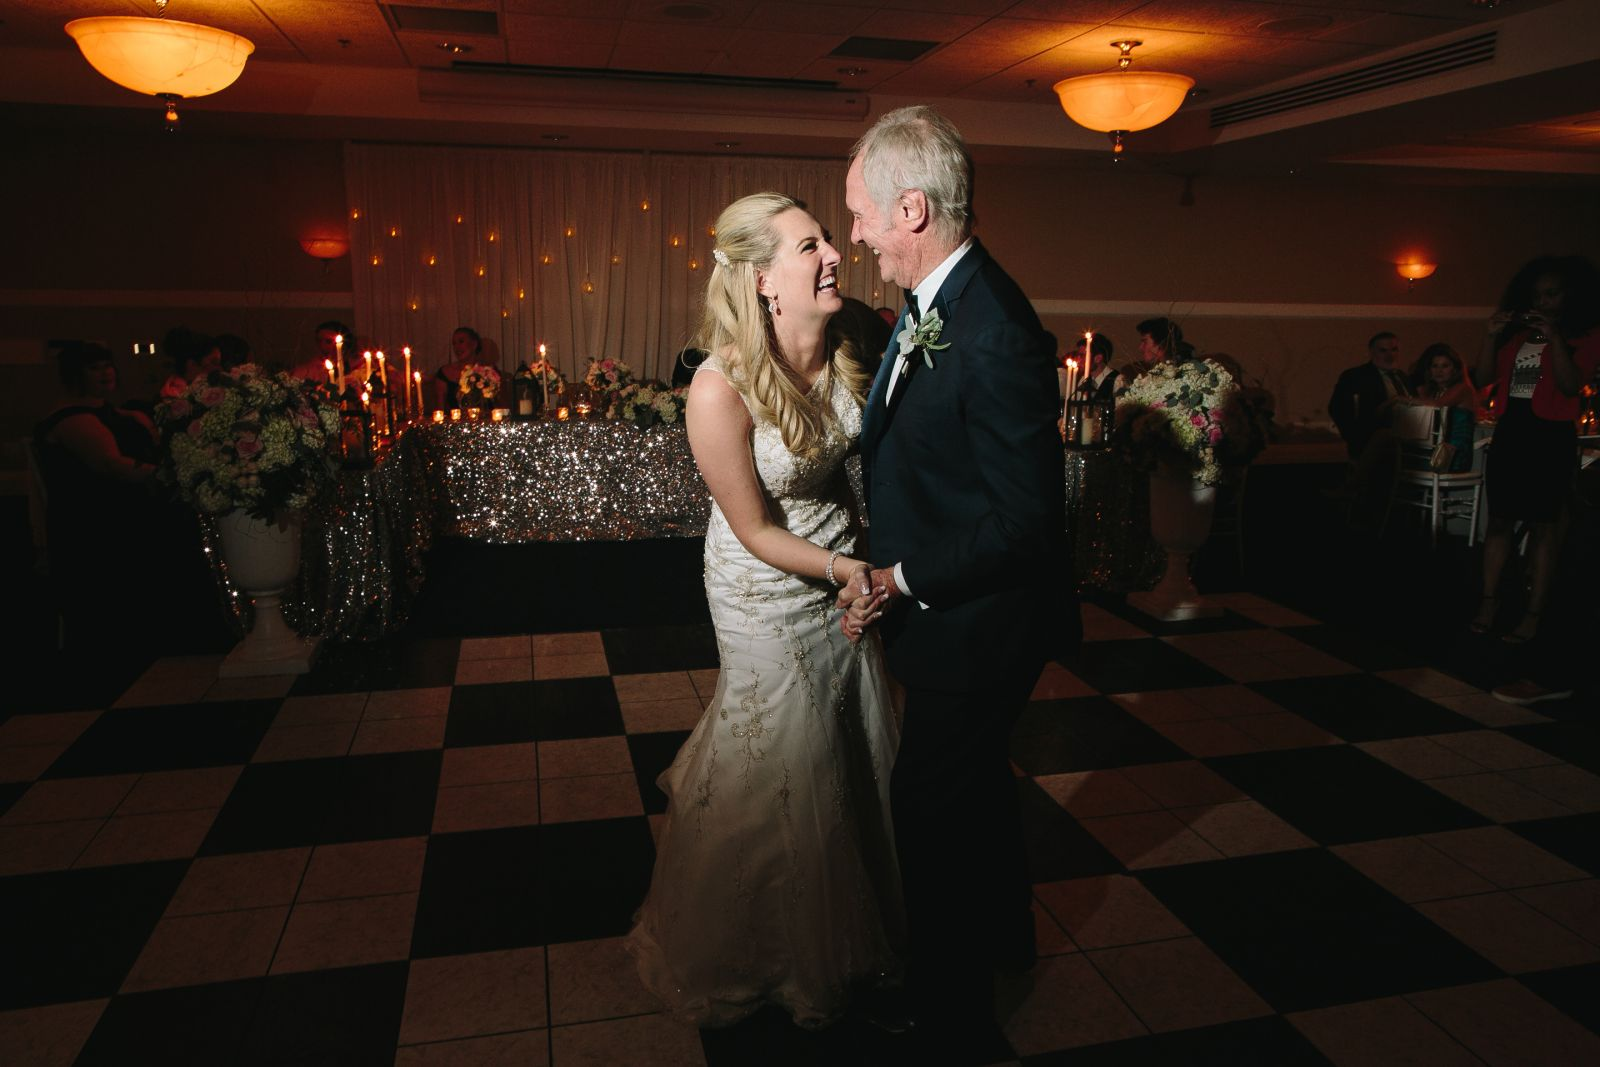 Wedding Receptions Pluister Entertainment Inc